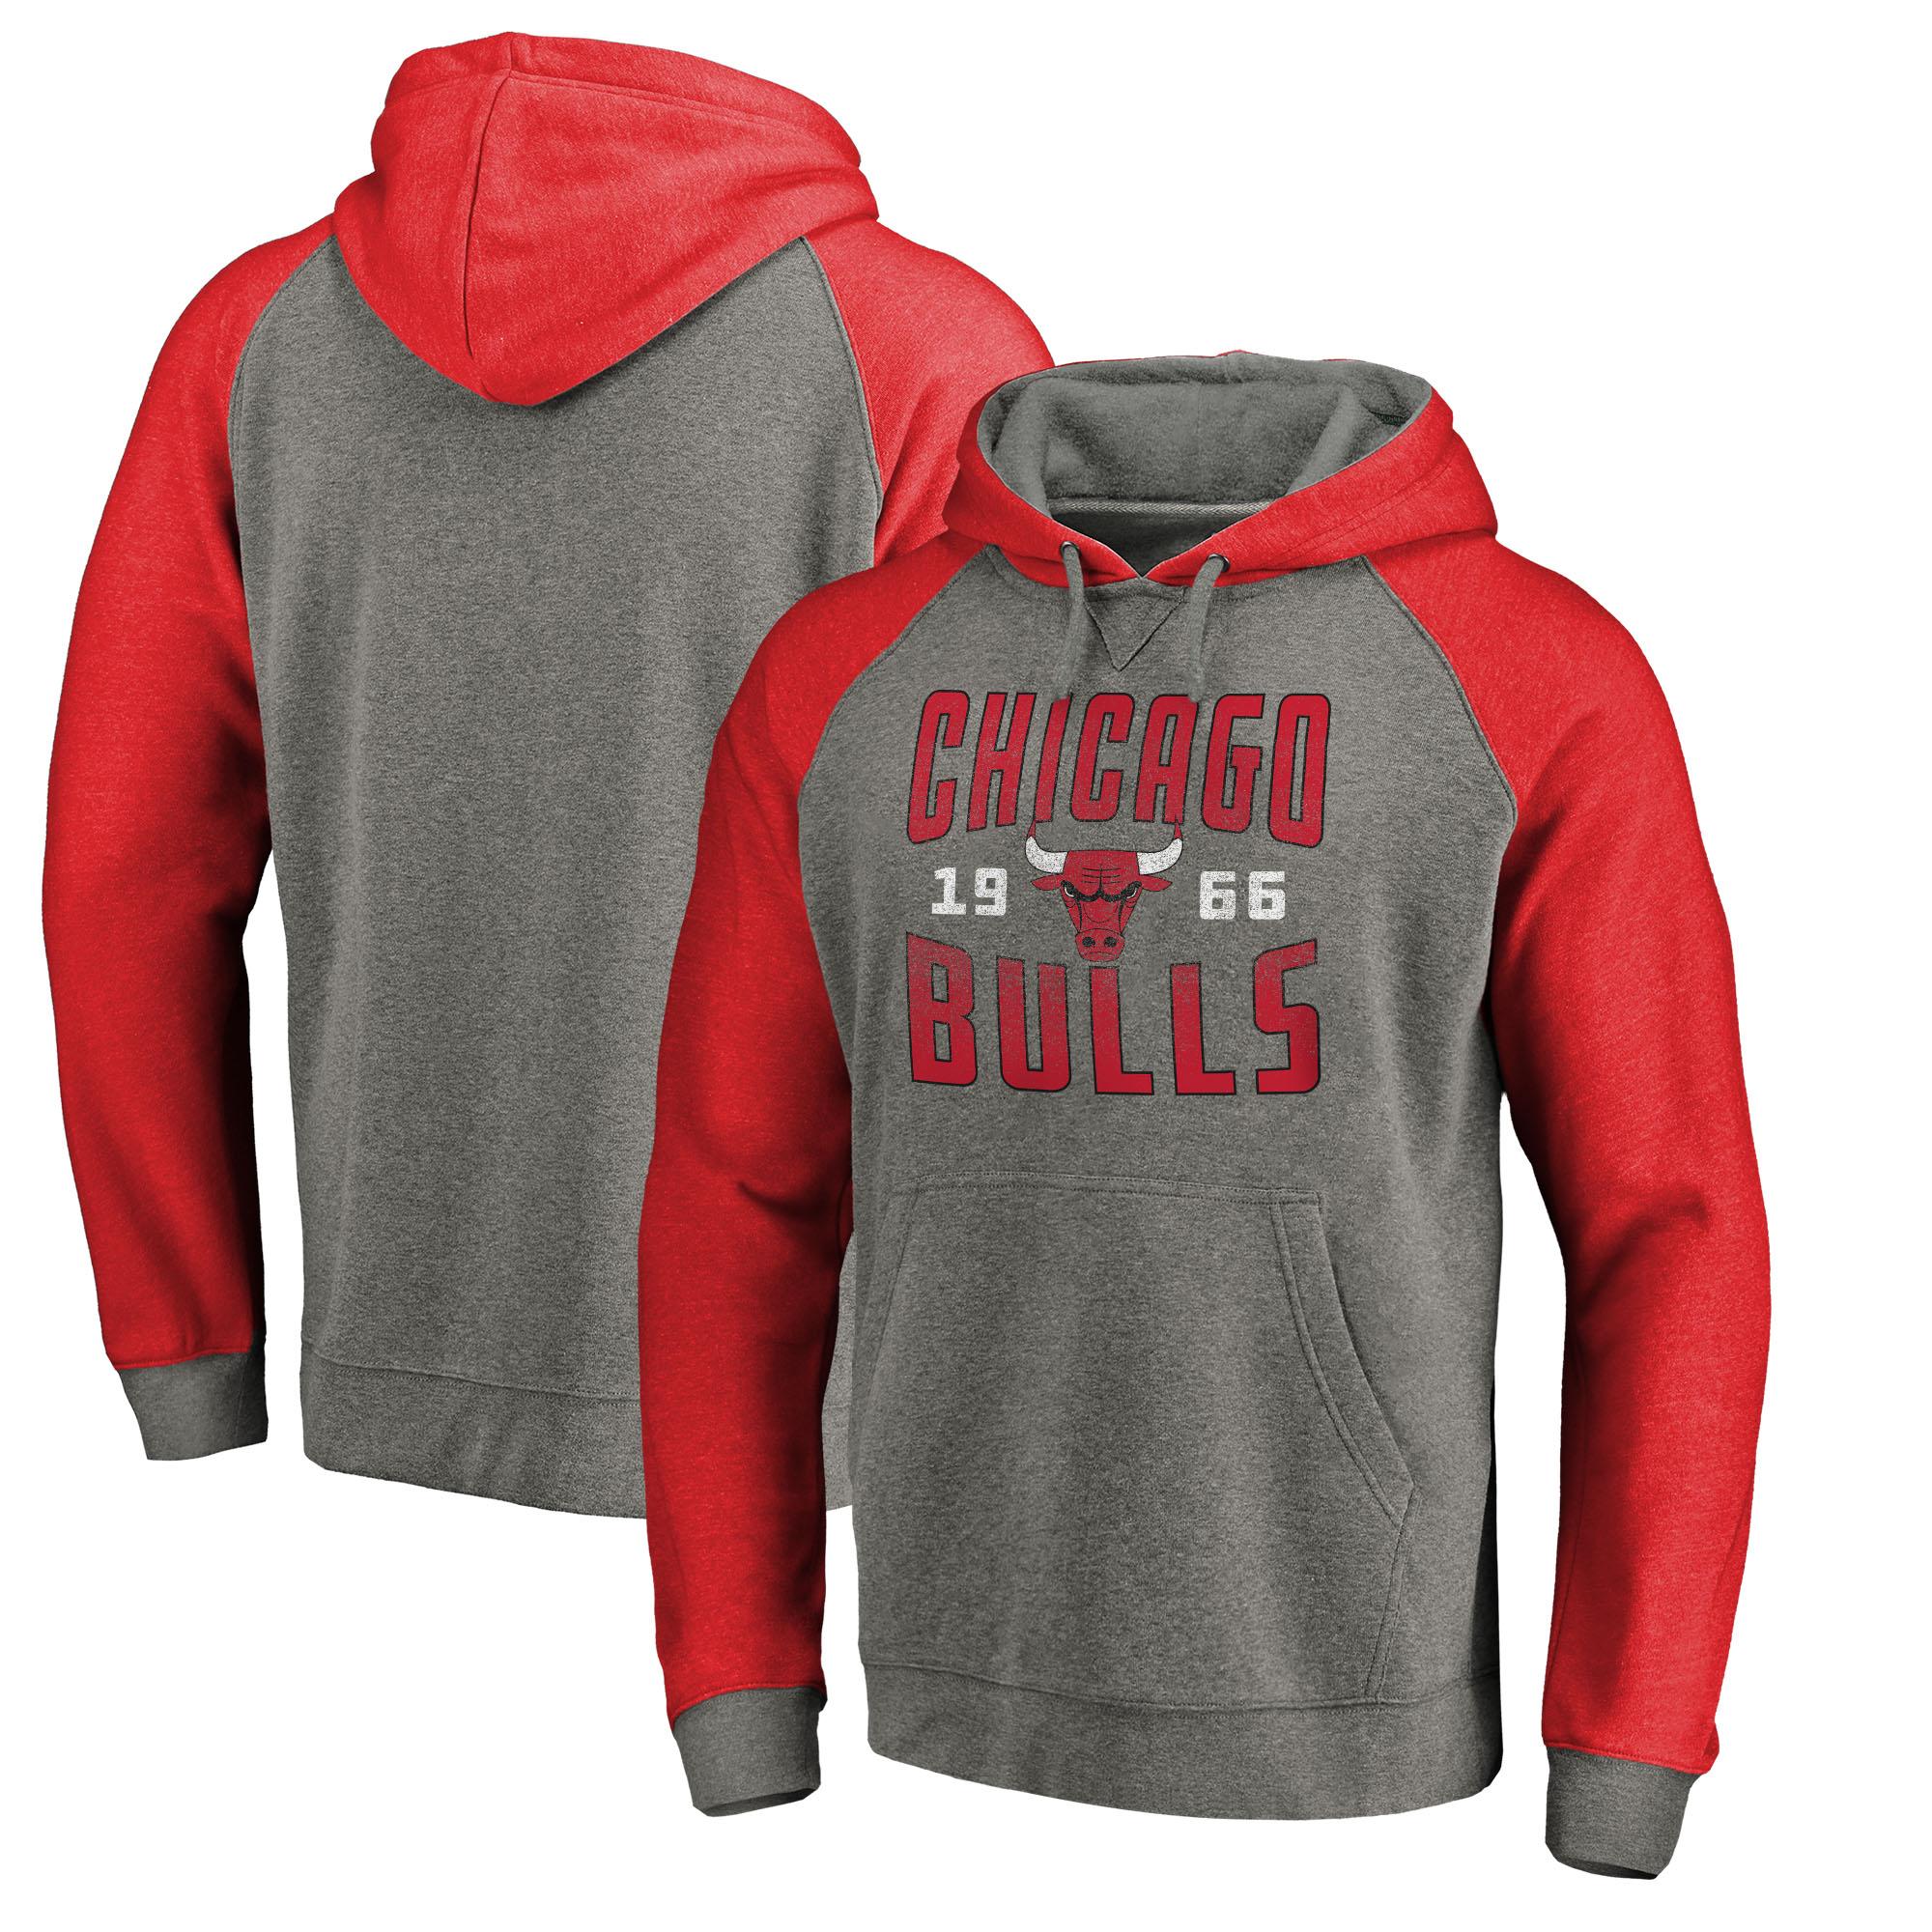 Chicago Bulls Fanatics Branded Antique Stack Big & Tall Tri-Blend Raglan Pullover Hoodie - Ash